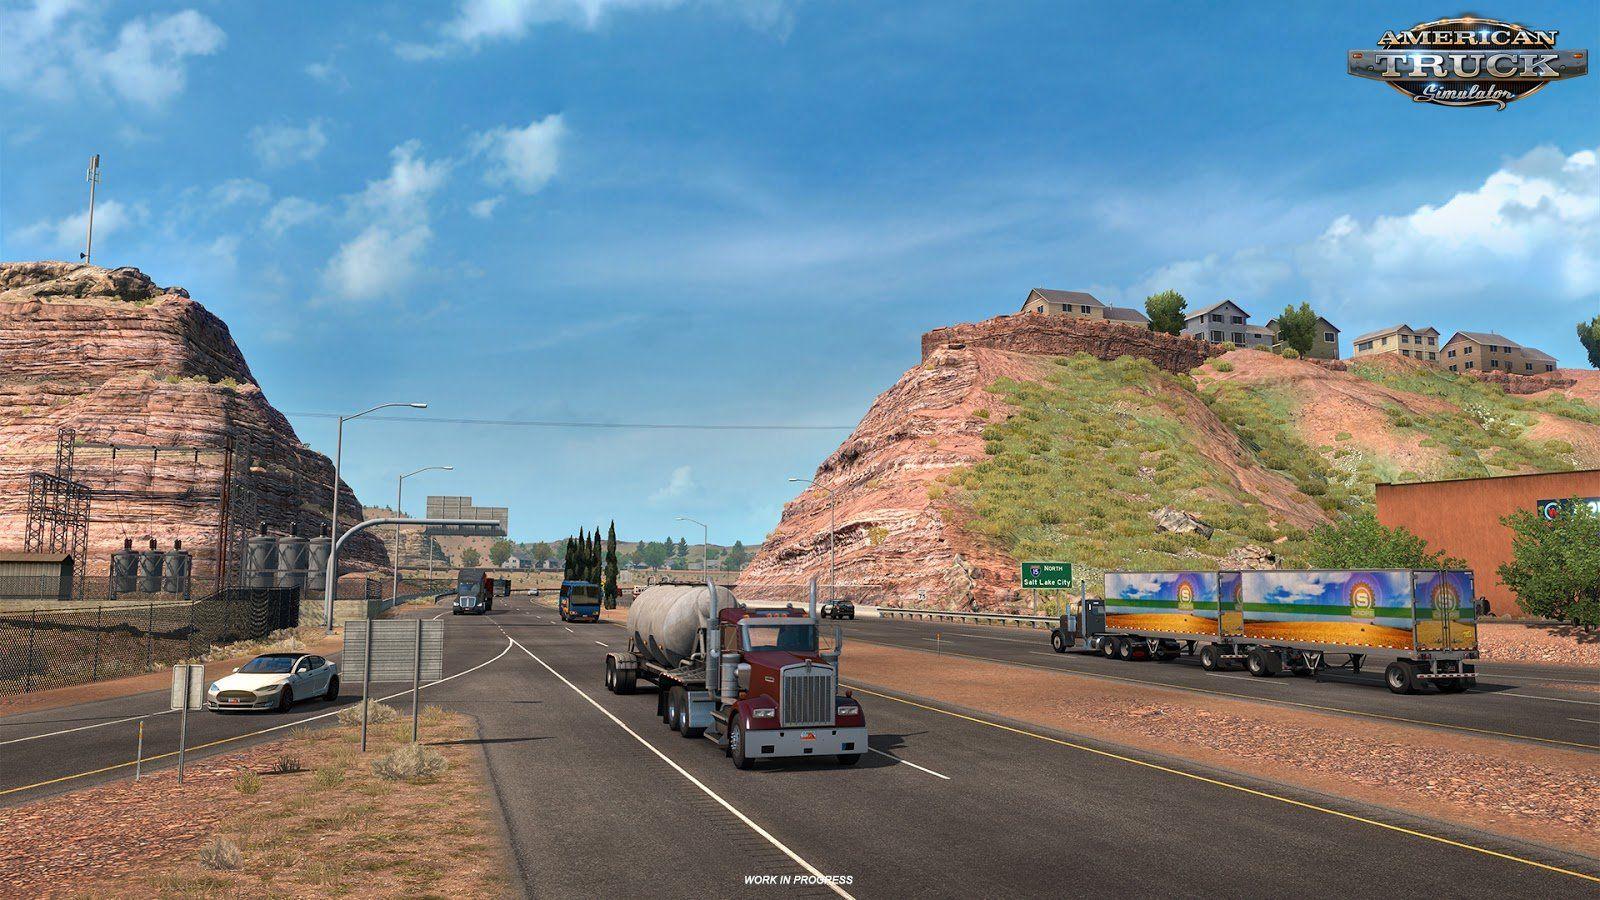 Utah Dlc This State Rocks With Images